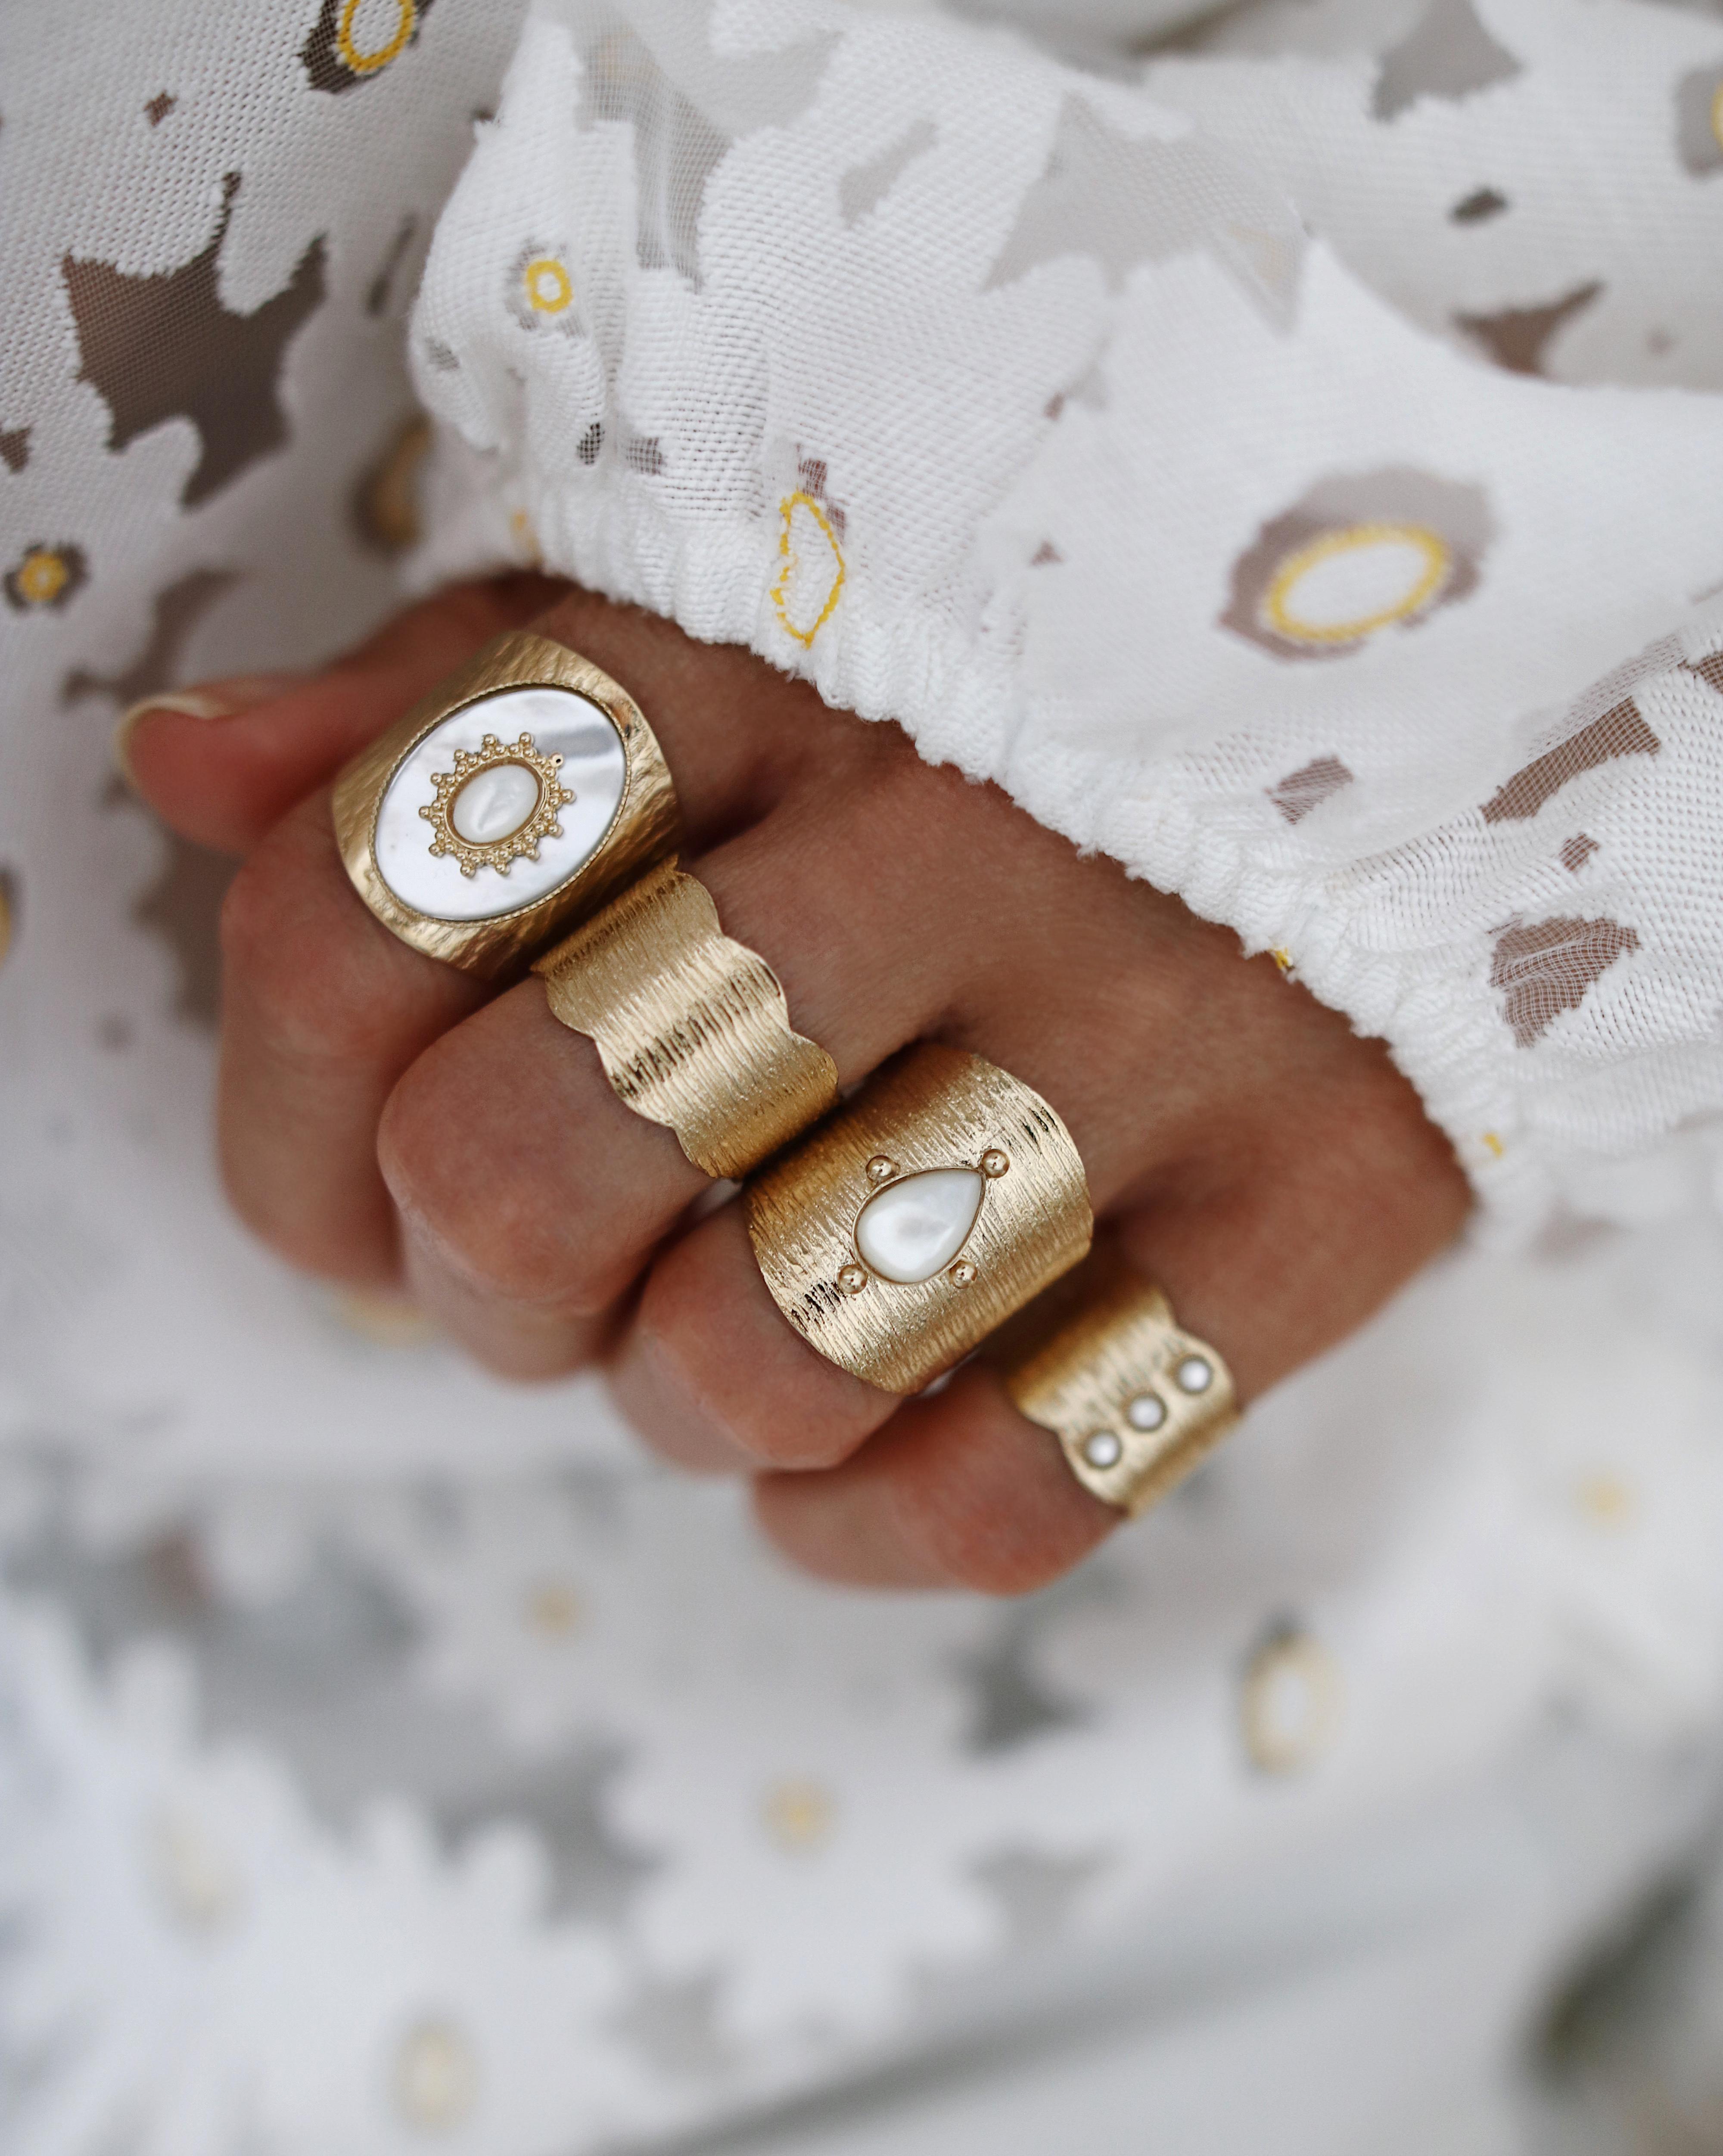 @chon.and.chon www.chonandchon.com ) accumulation bagues, les folies d'agnèes bijoux - bijoux fait mains, handmade jewelry, jewelry photographer, jewelry blogger, jewelry addiction, rings set